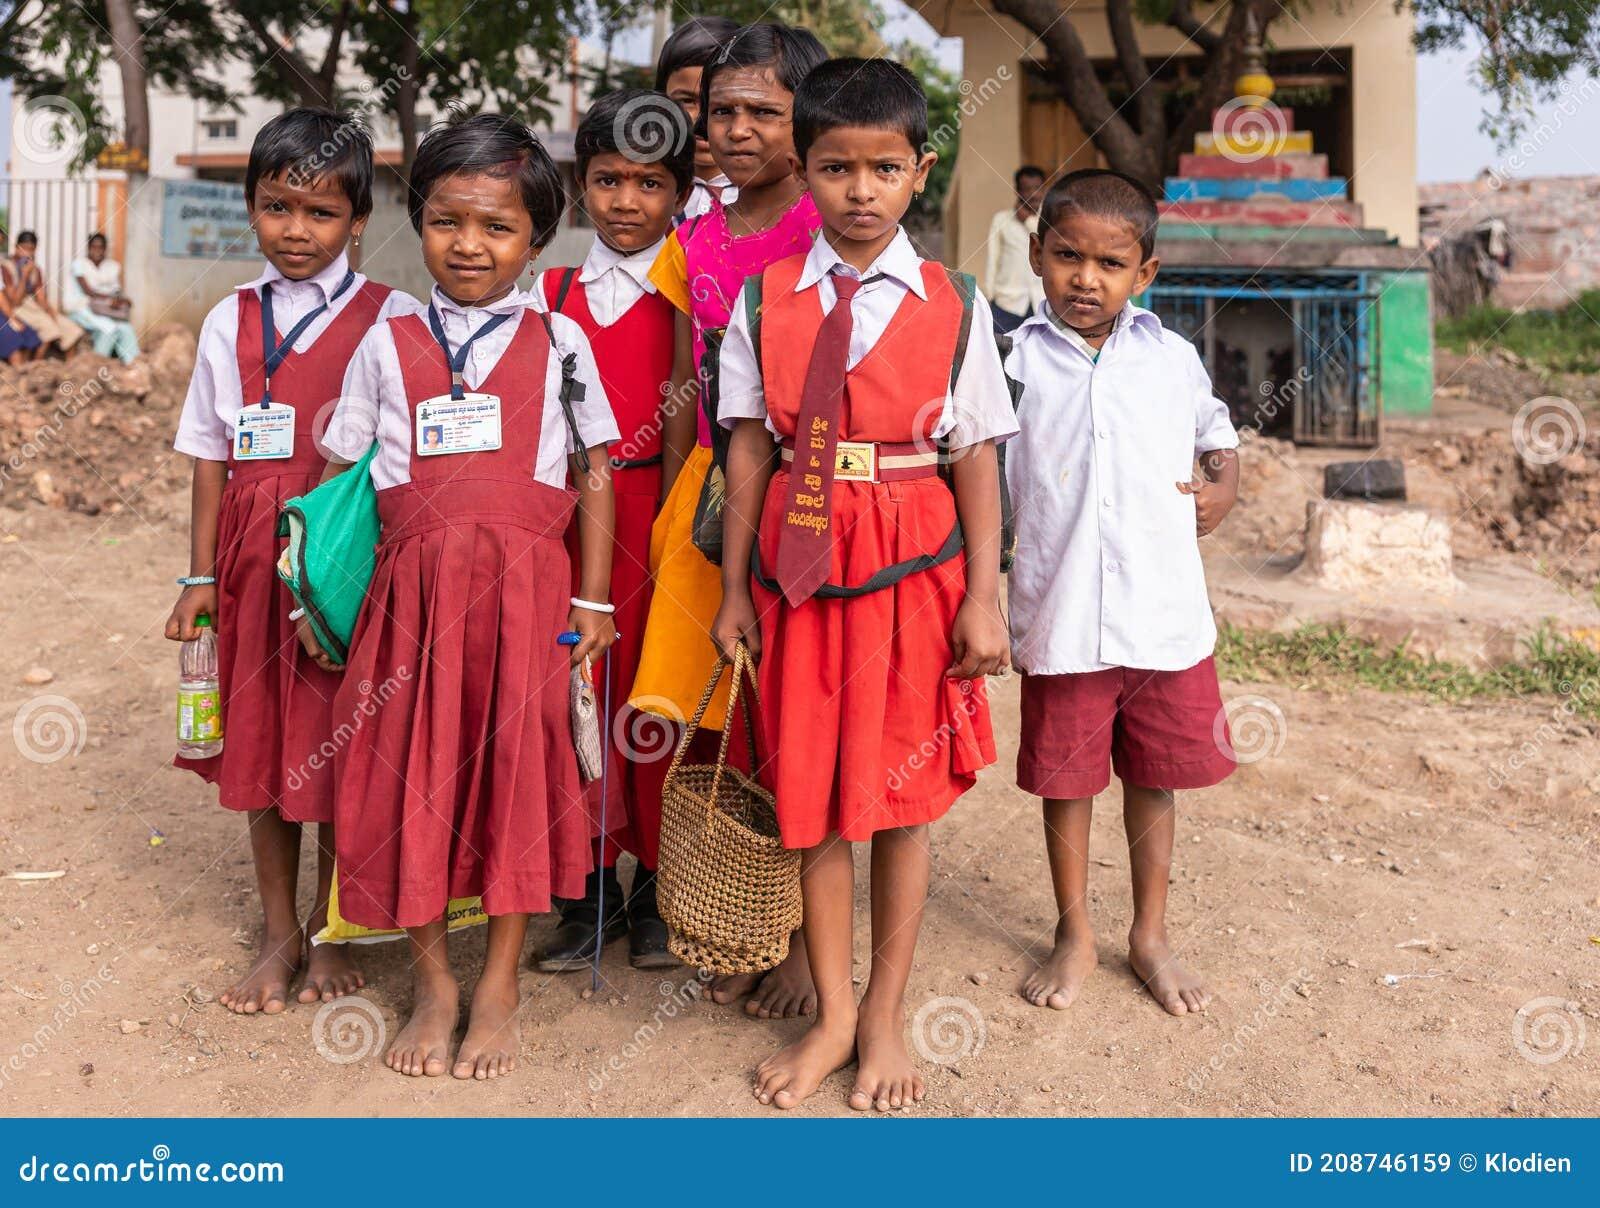 https://thumbs.dreamstime.com/z/nandakeshwar-karnataka-india-november-closeup-group-small-primary-school-girls-maroon-red-dress-uniform-white-208746159.jpg